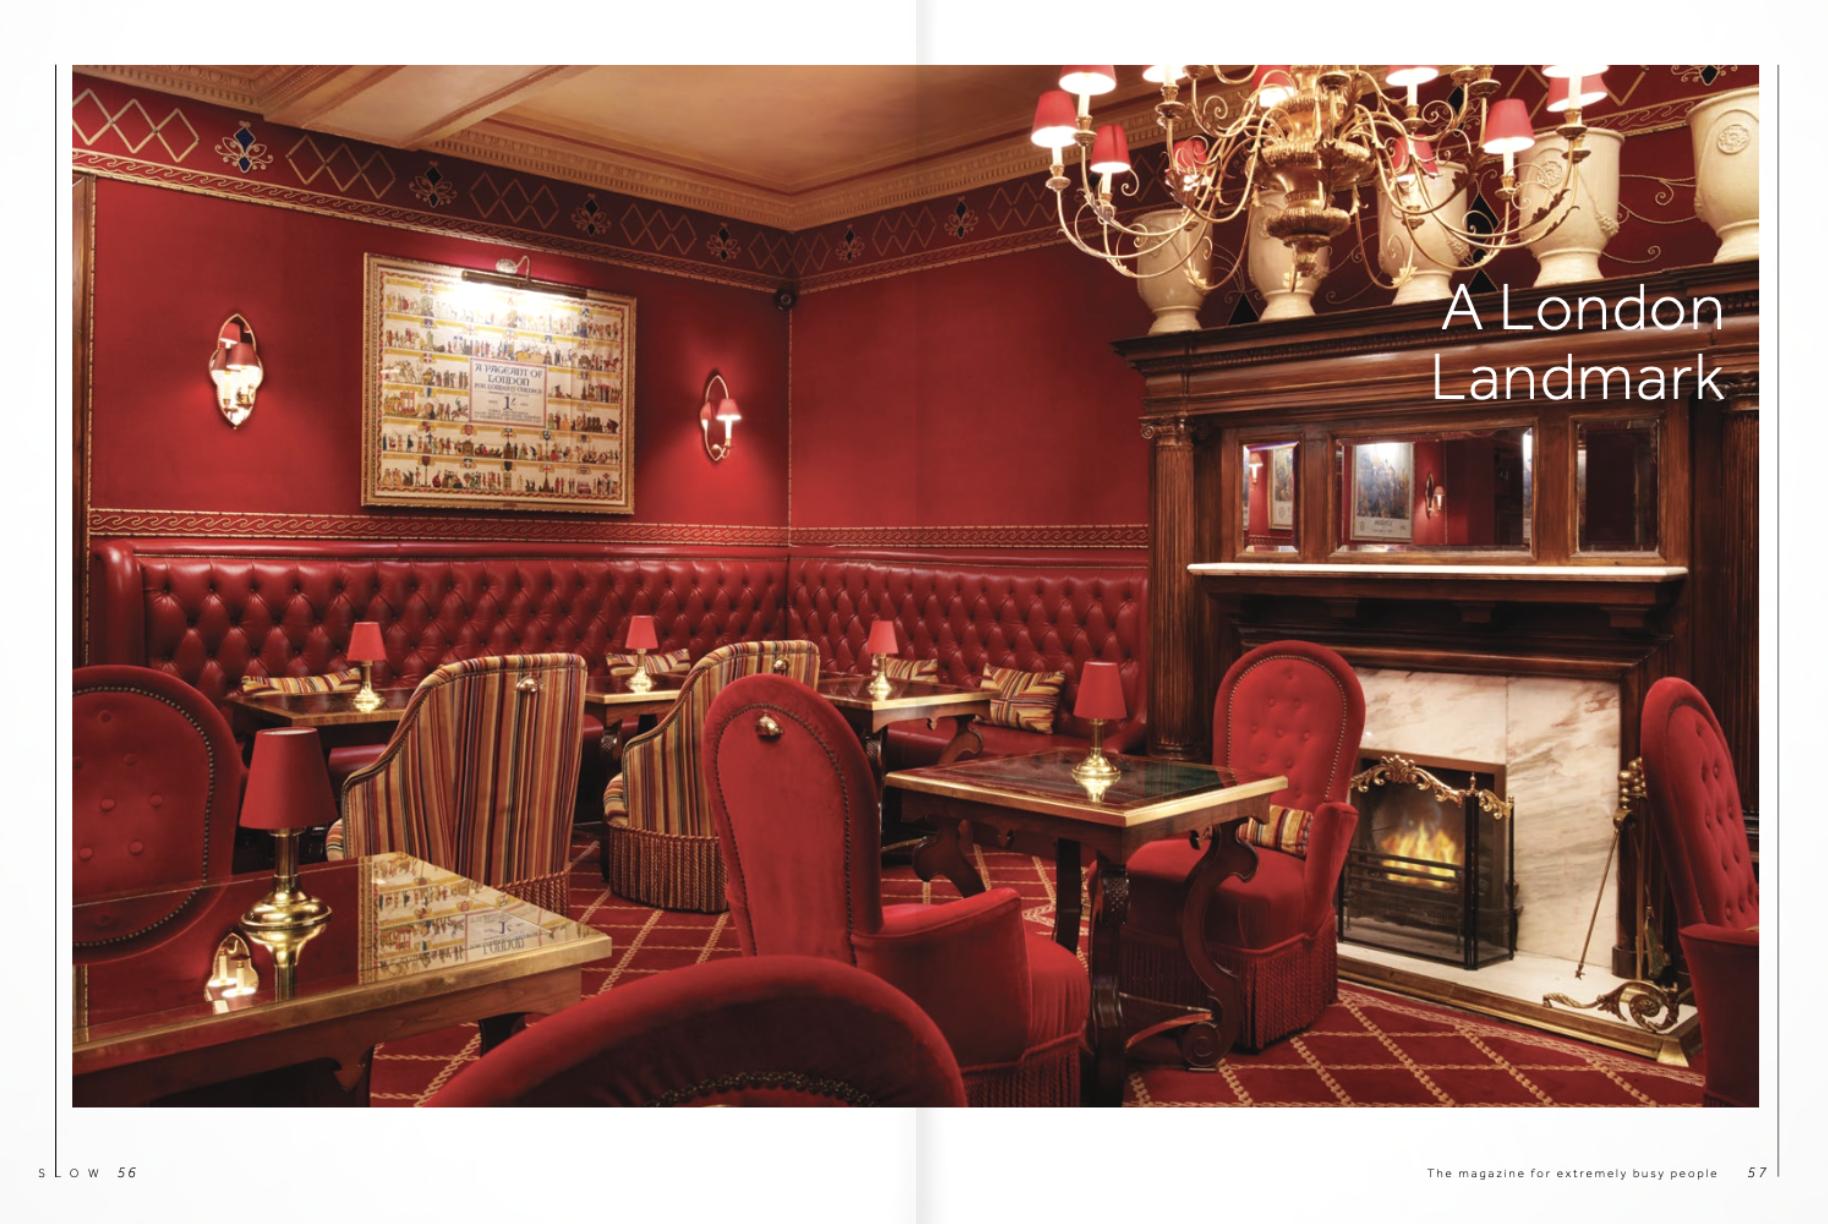 The Rubens Hotel, London